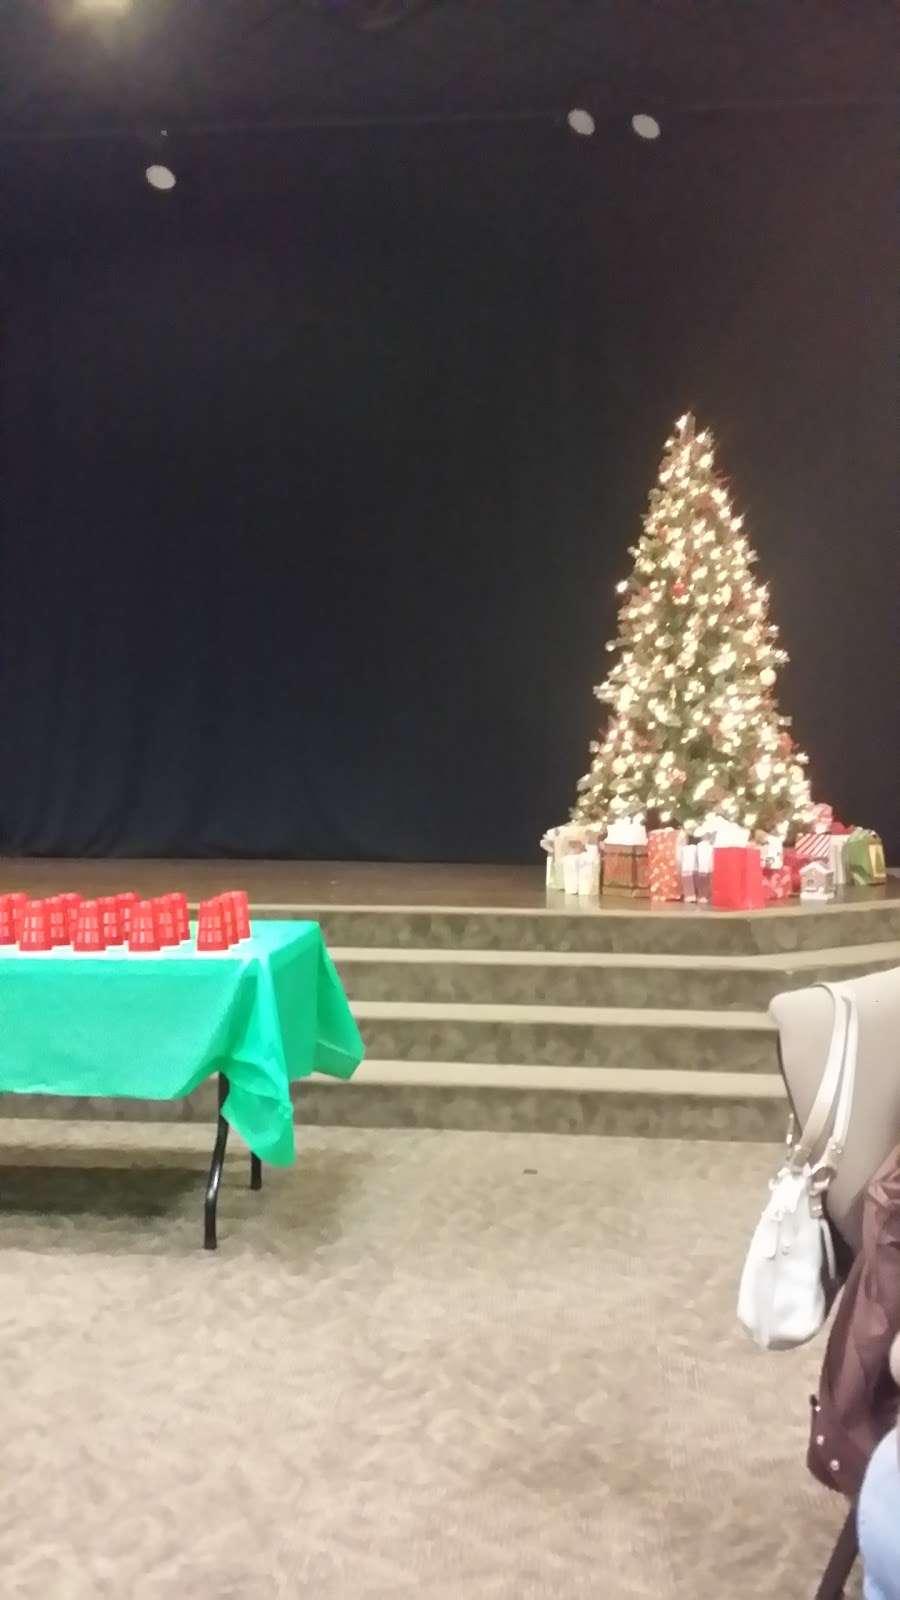 Crossroads Fellowship - church  | Photo 10 of 10 | Address: 12110 East Sam Houston Pkwy N, Houston, TX 77044, USA | Phone: (713) 455-1661